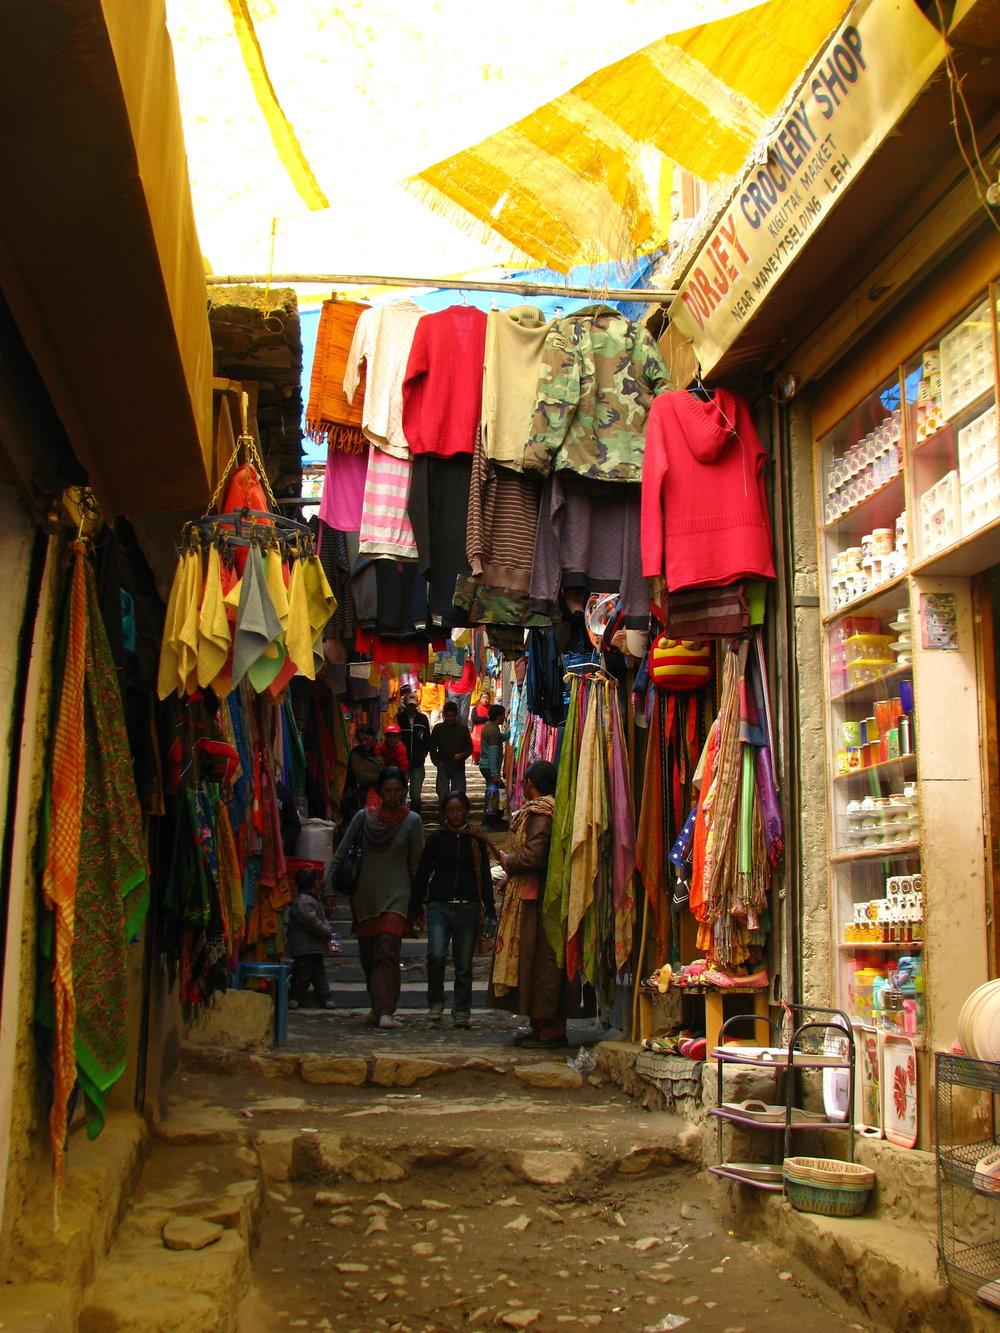 India_-_Ladakh_-_Leh_-_079_-_Market_3909712362.jpg